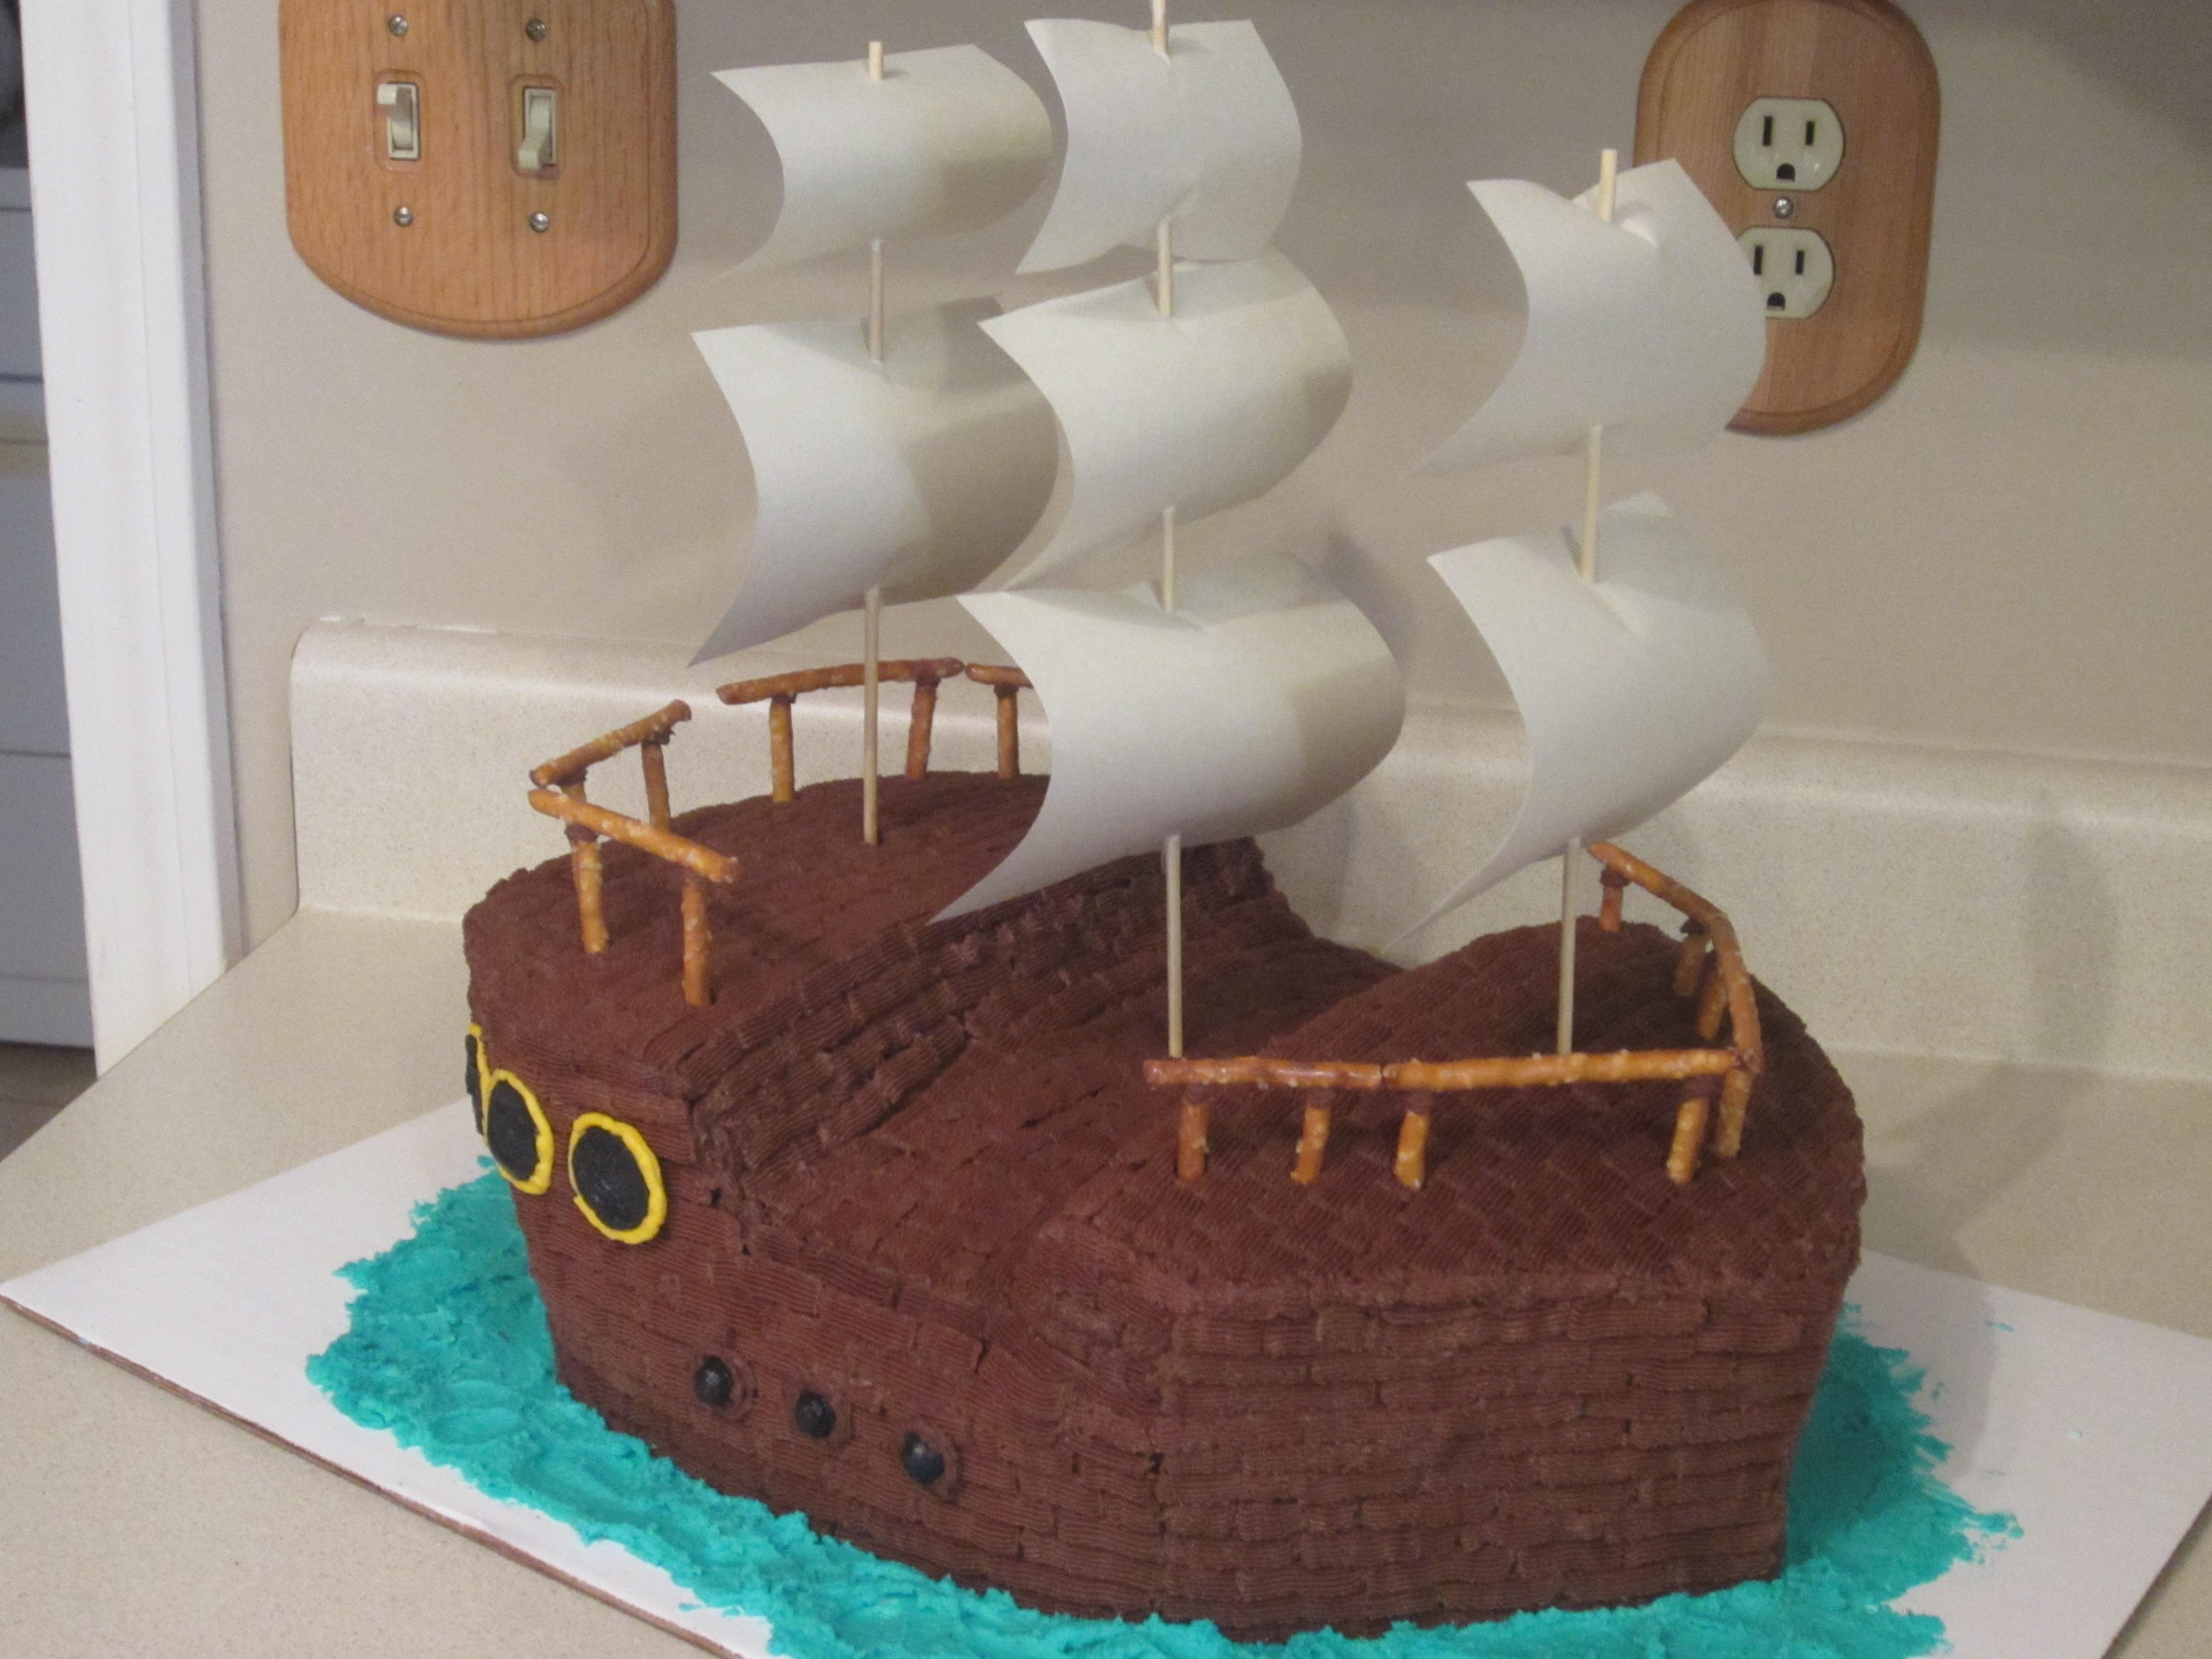 Birthday Cakes - CakeCentral.com